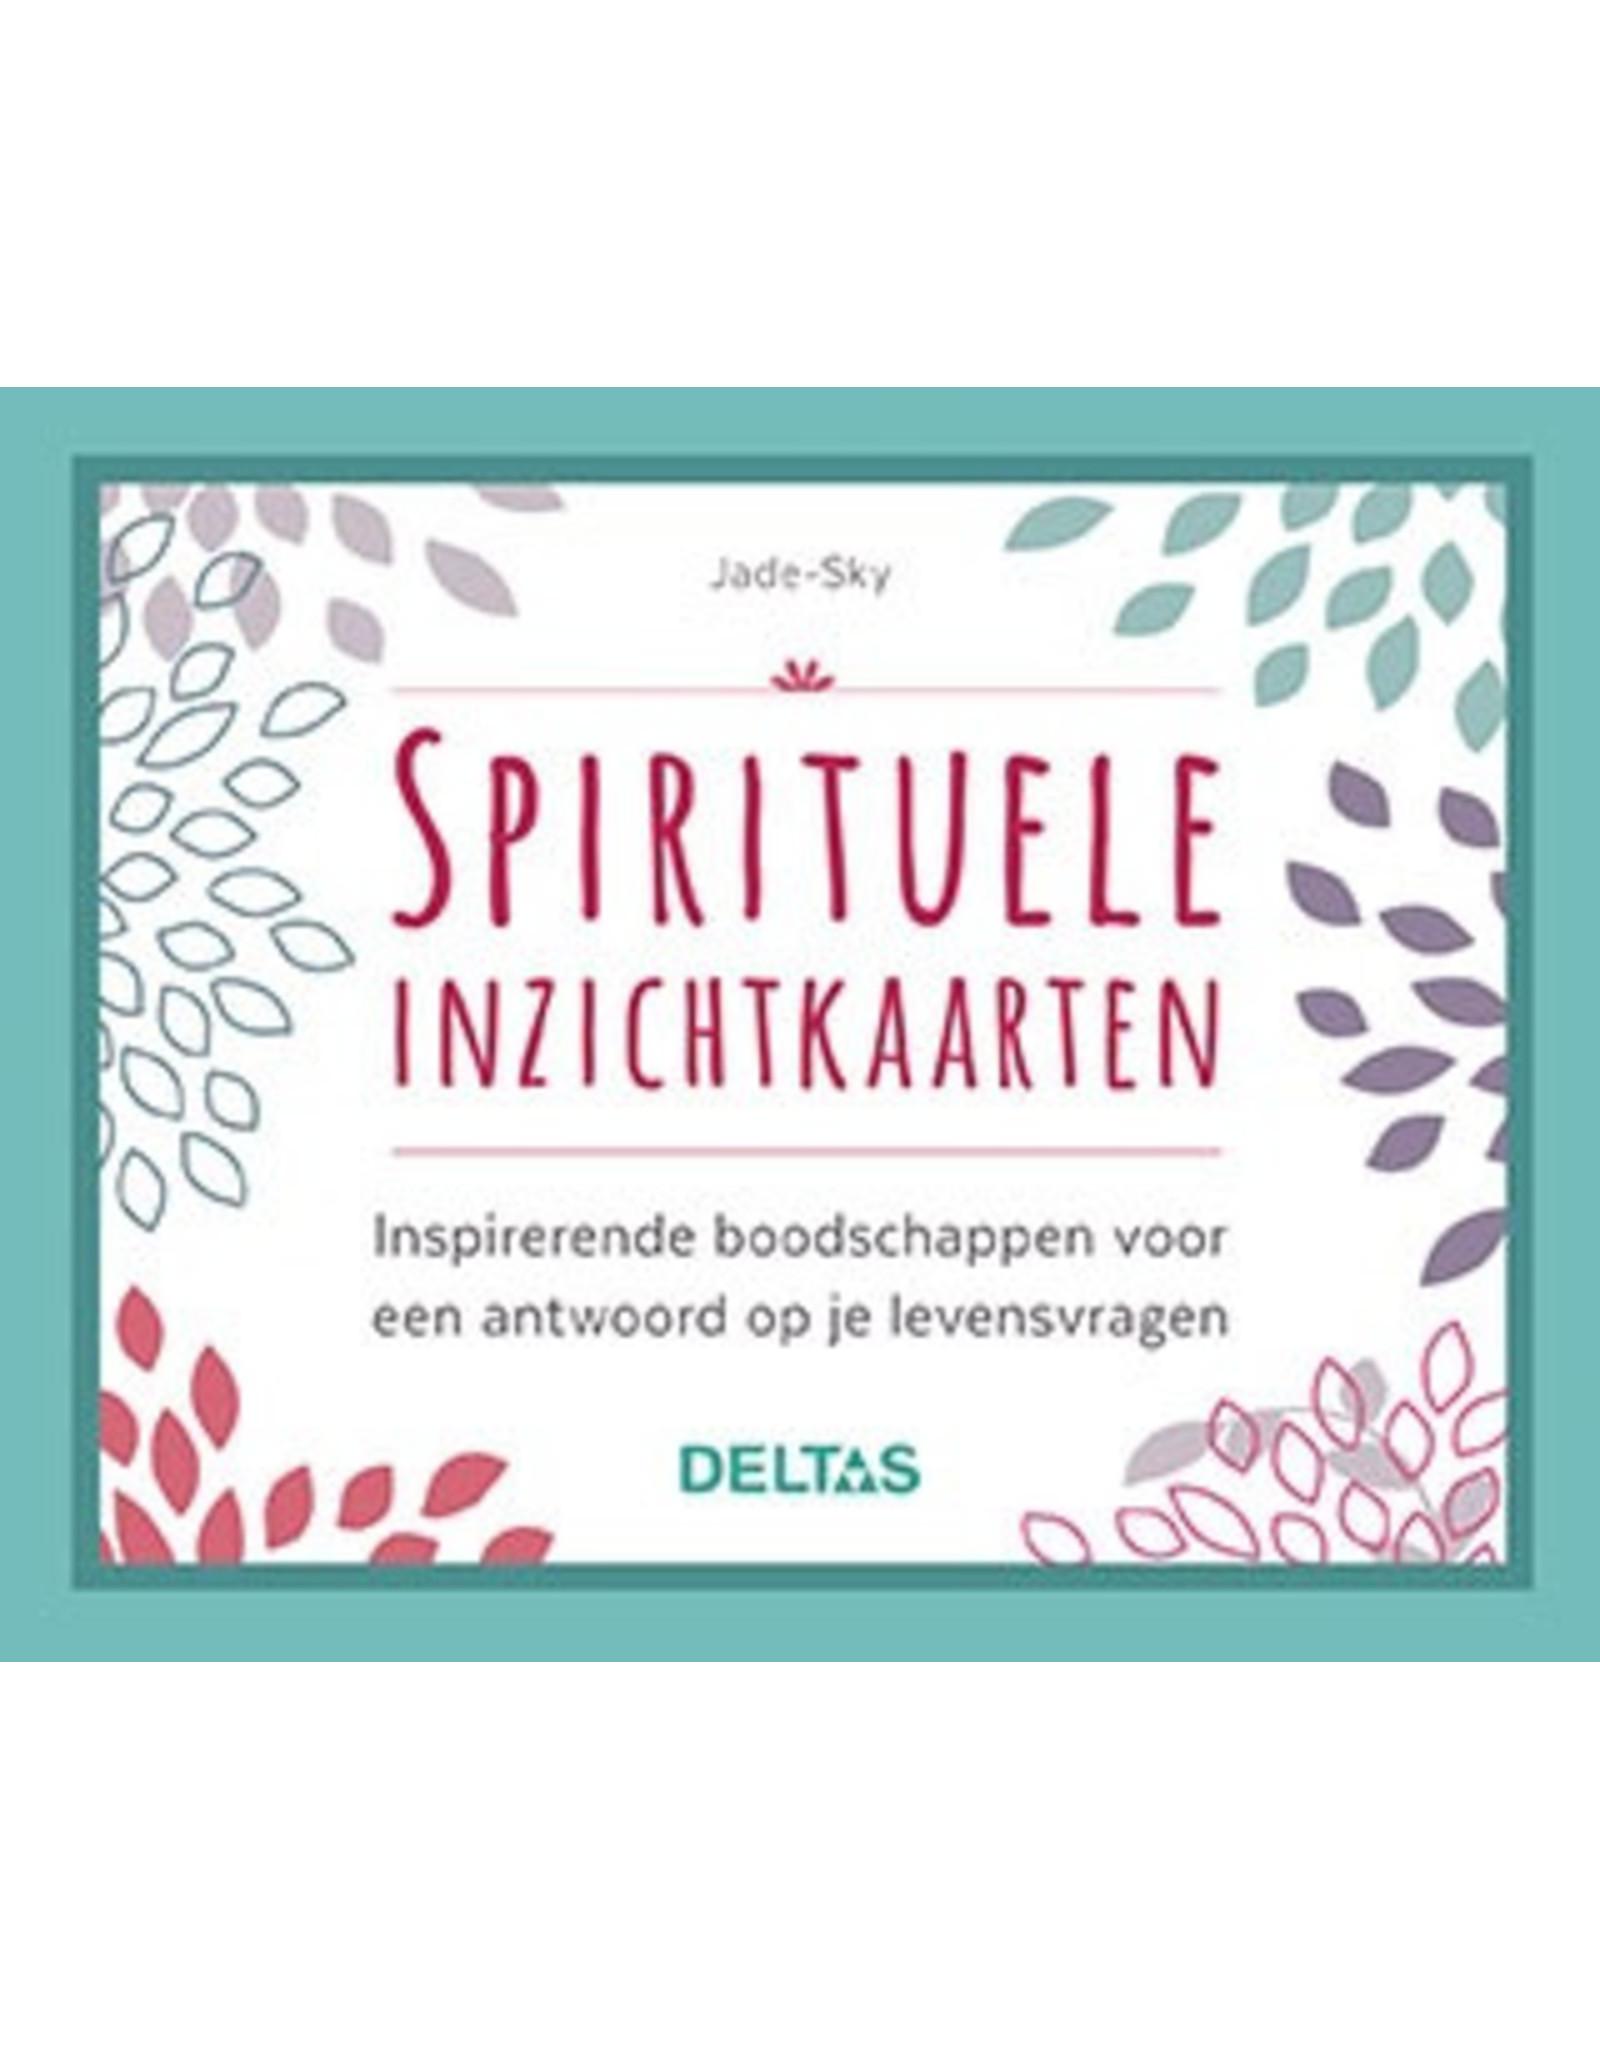 Deltas Spirituele inzichtkaarten